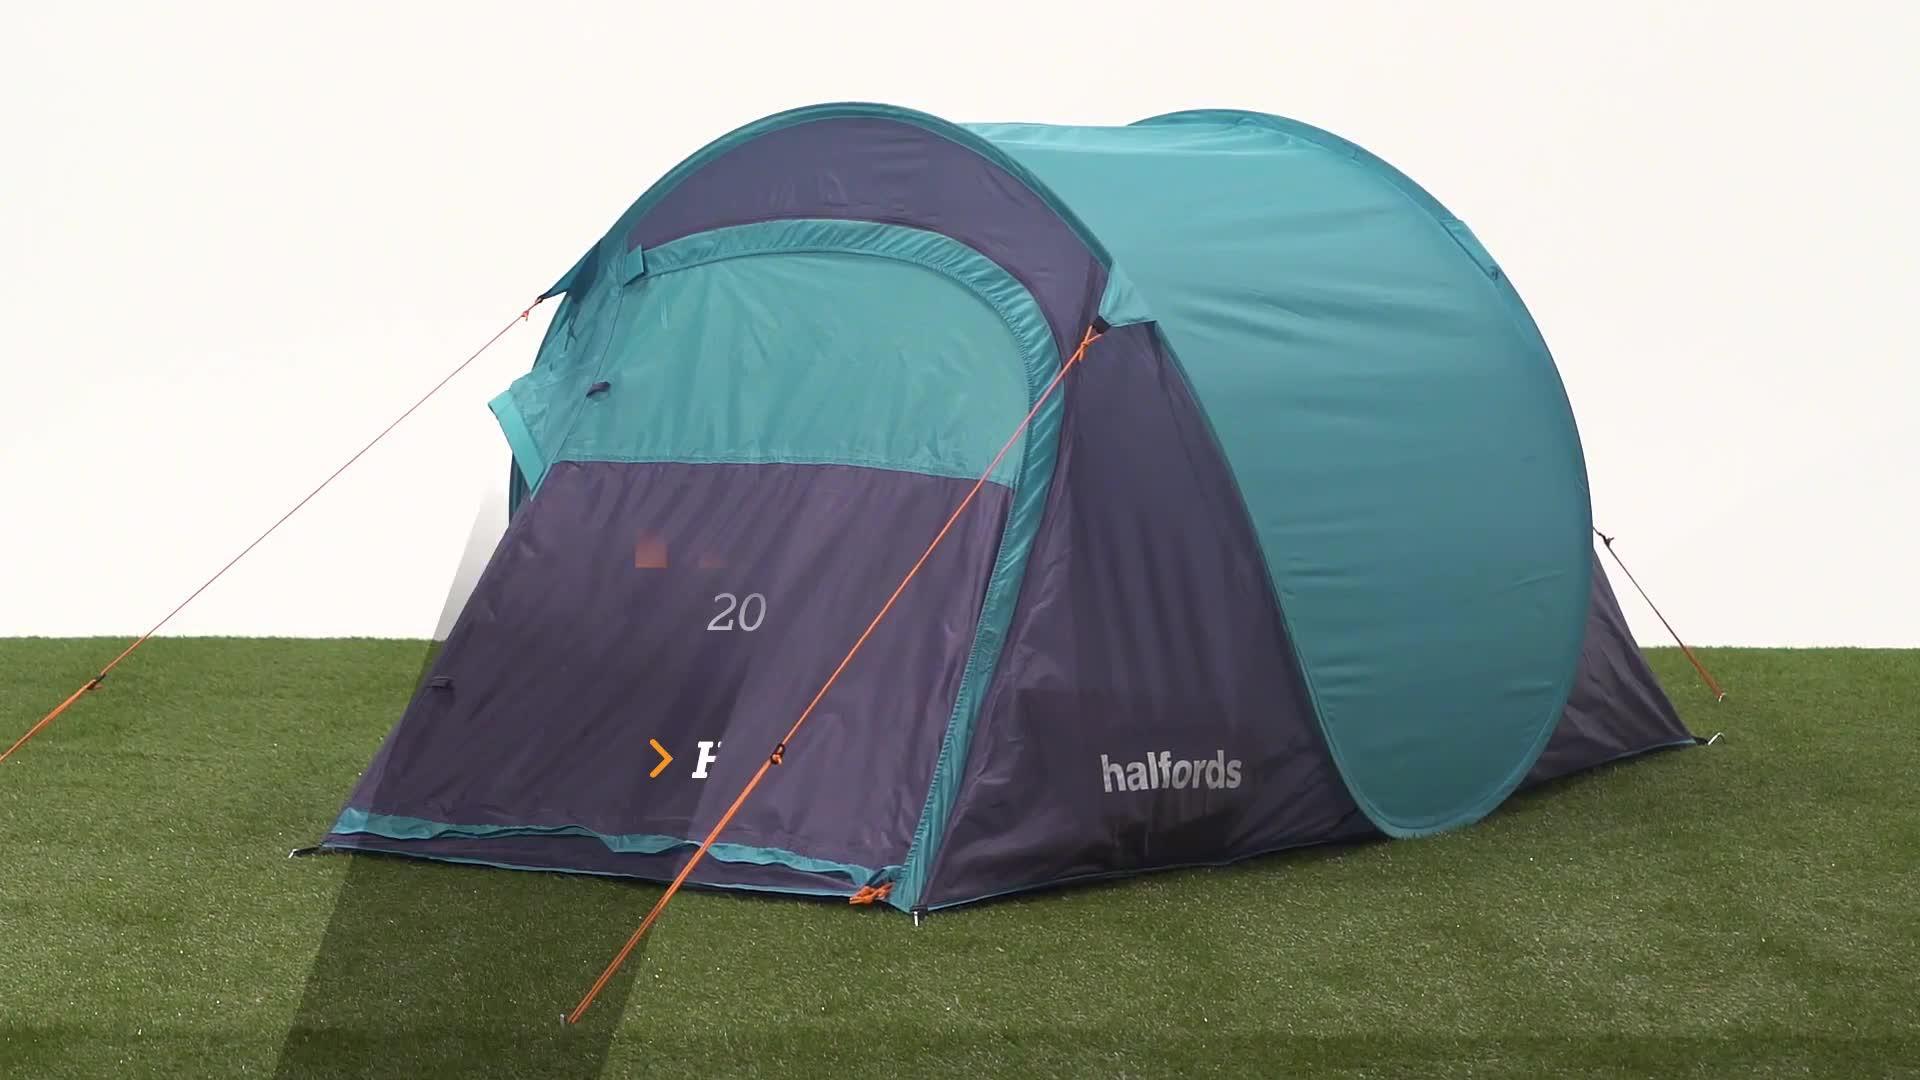 & Halfords 2 Man Pop Up Tent